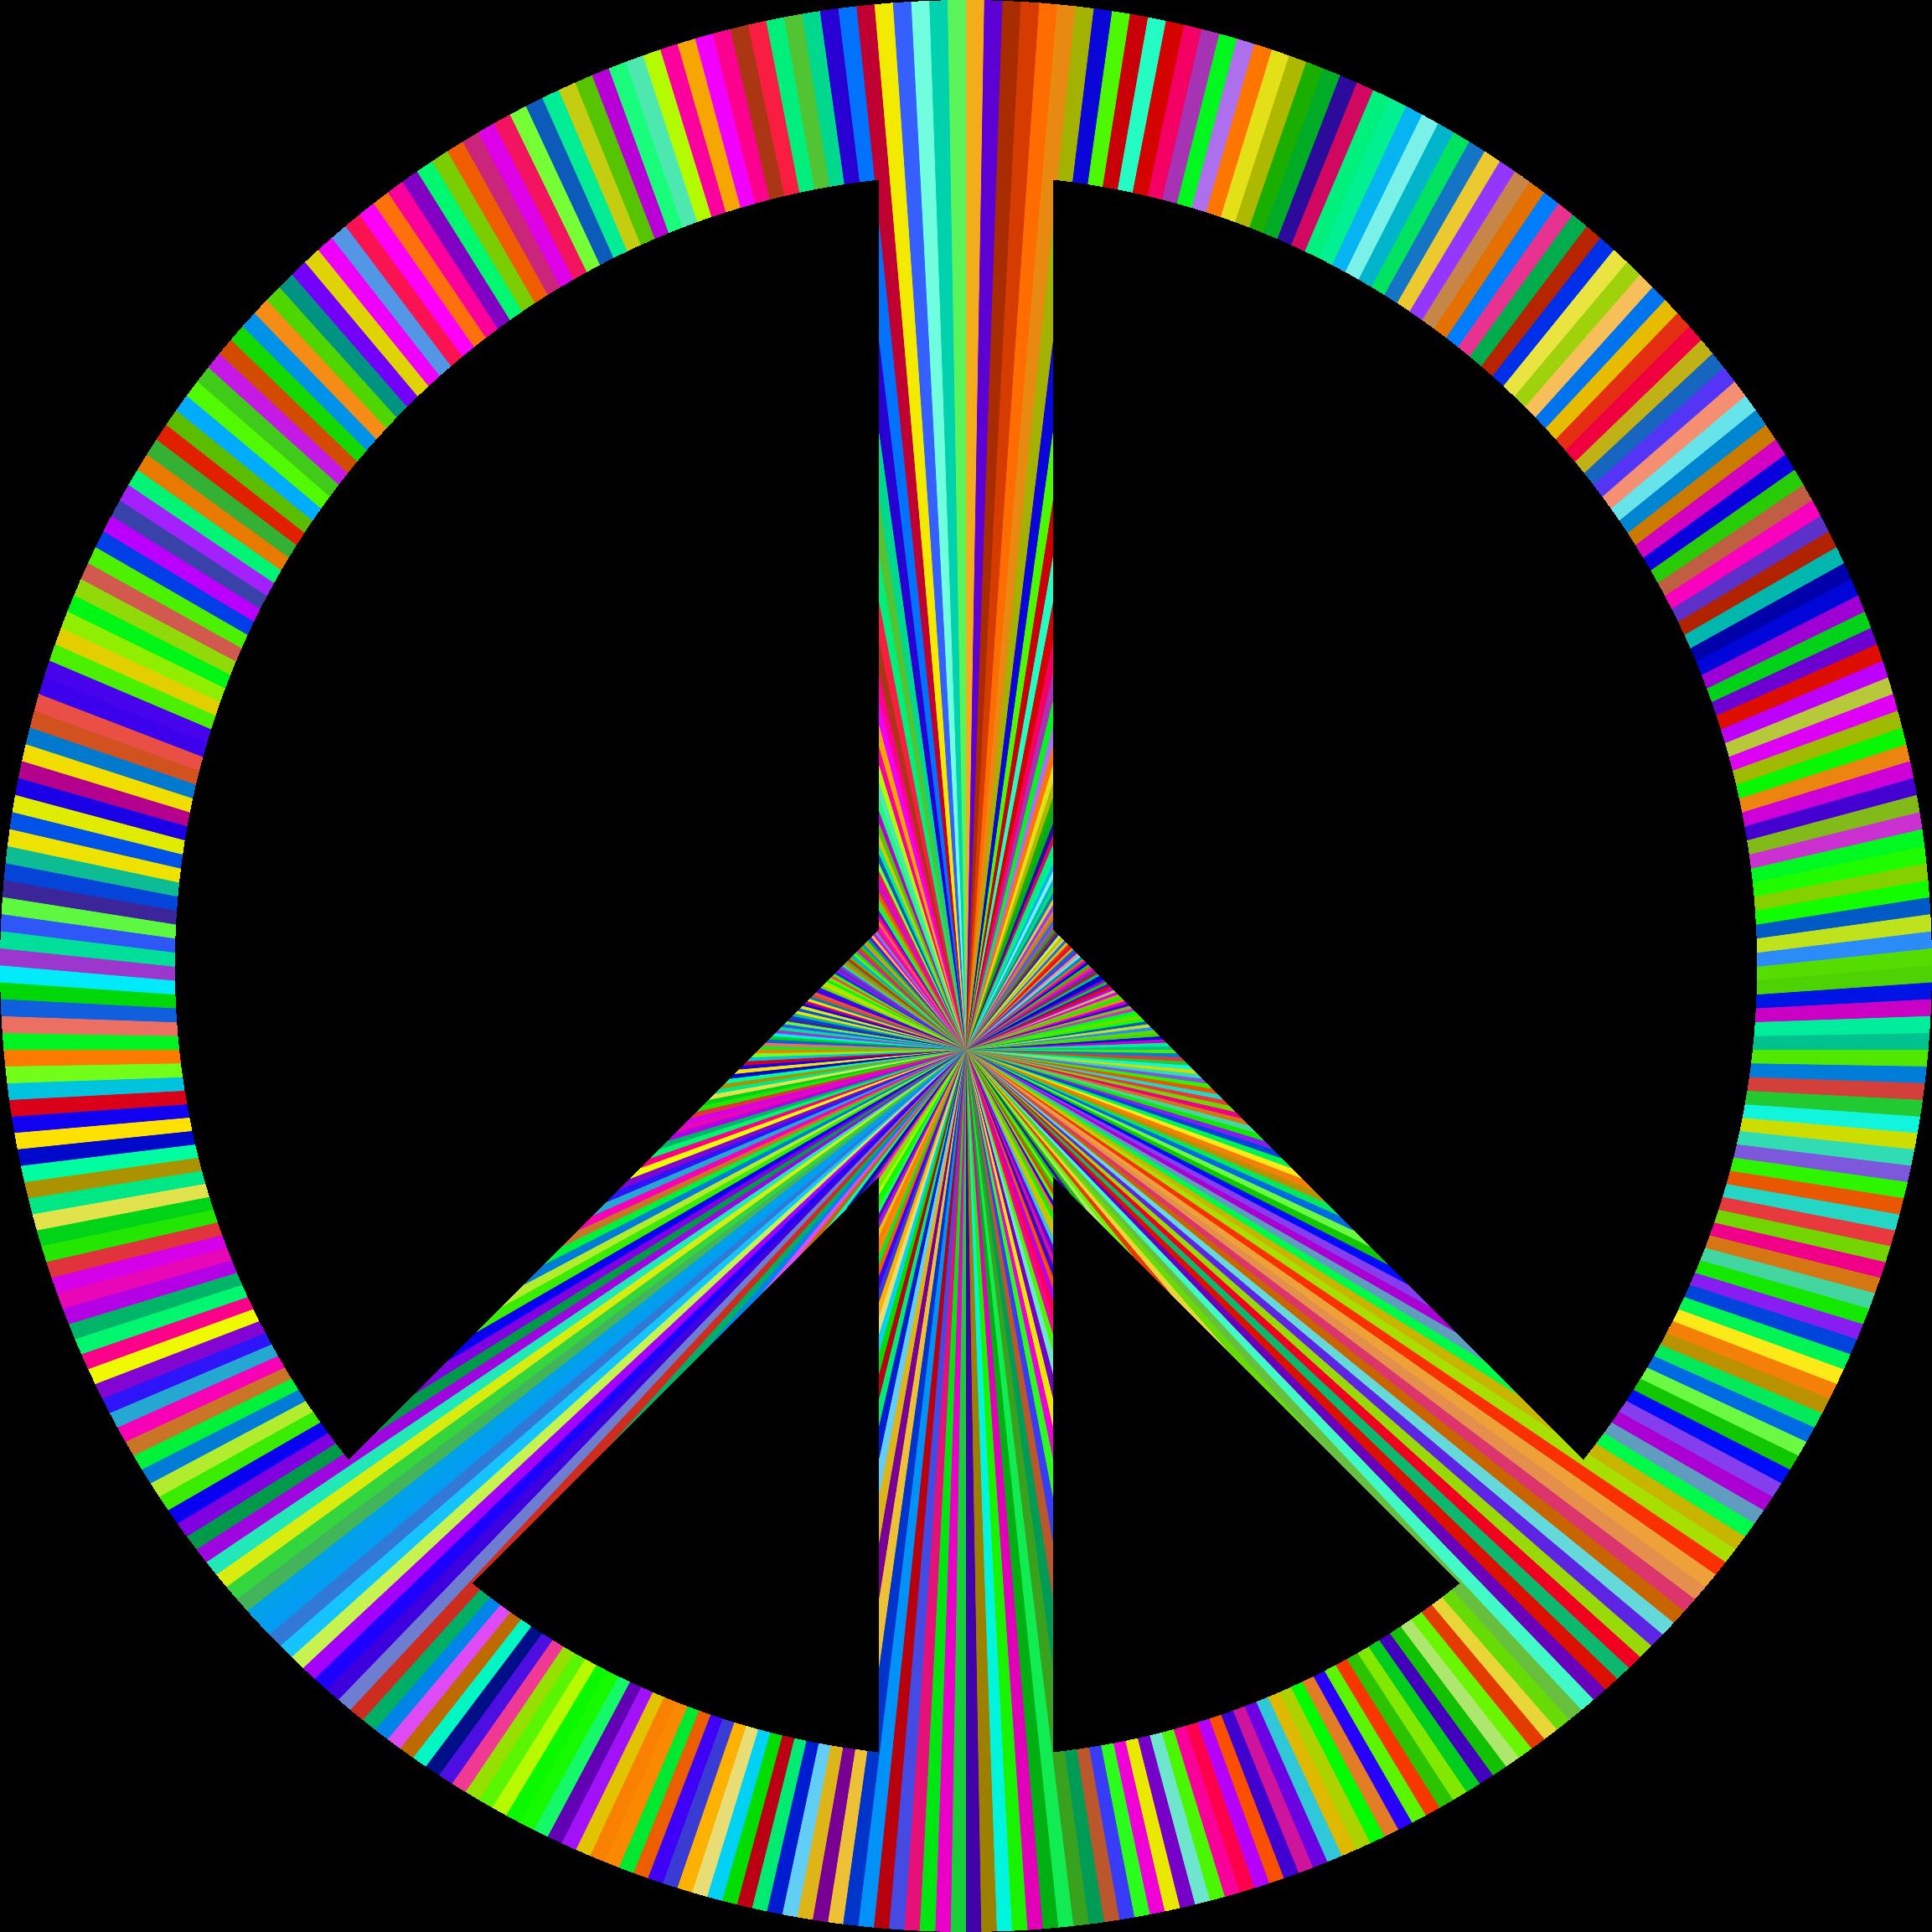 Sun burst clipart jpg free download Clipart - Peace Sign Sunburst jpg free download